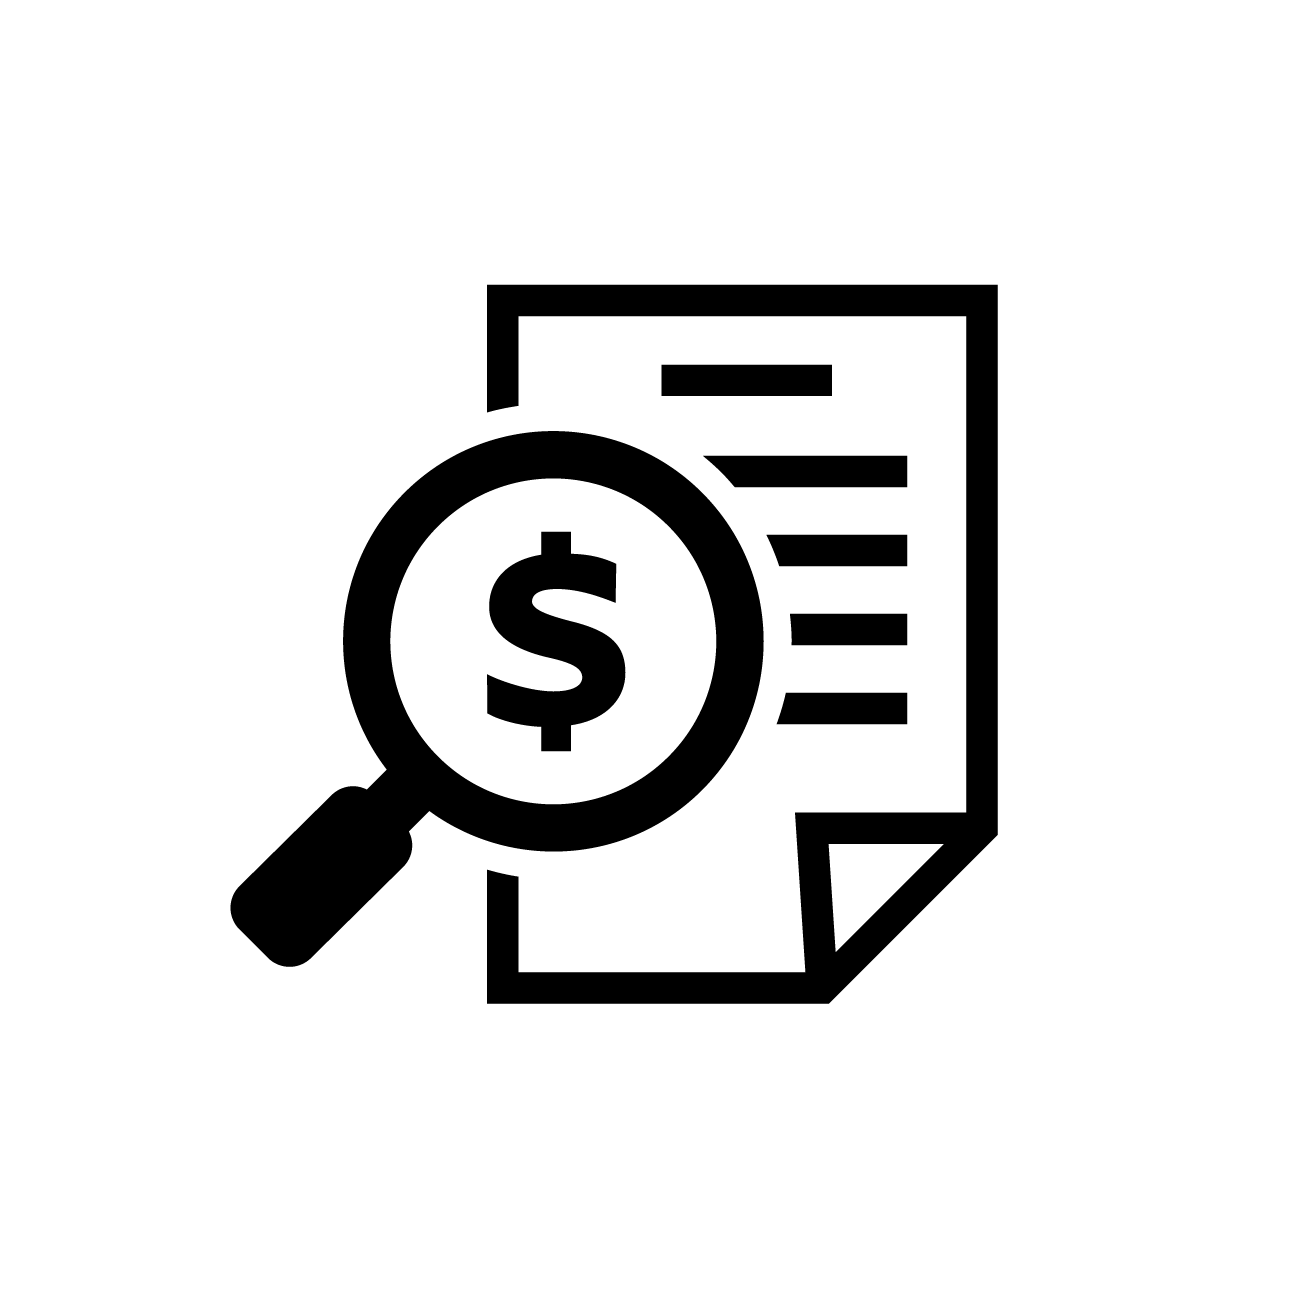 logo_fee1